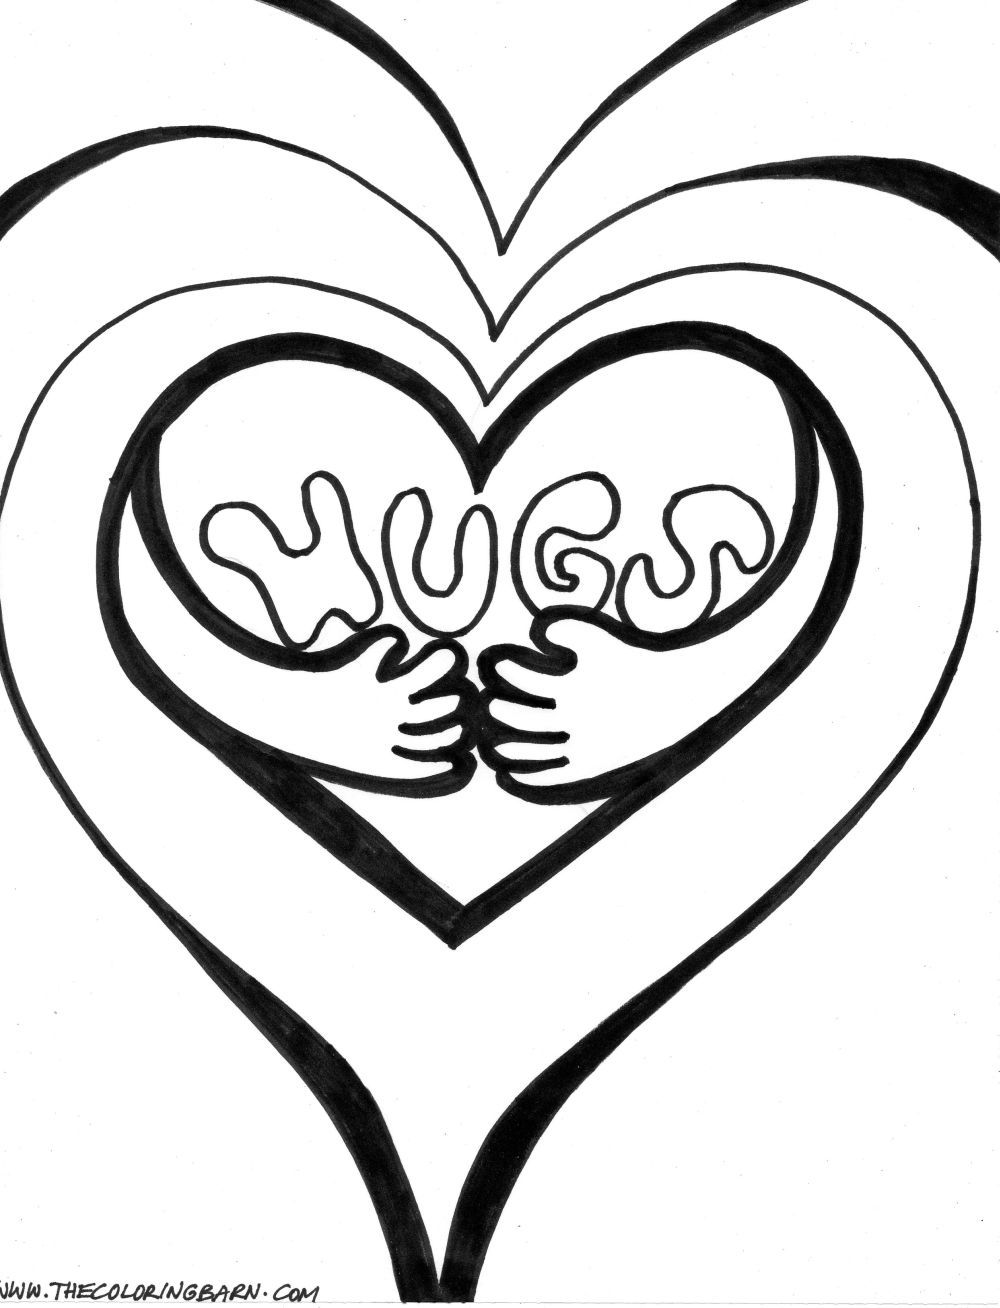 Un bonito dibujo de un corazn formando un abrazo de amor